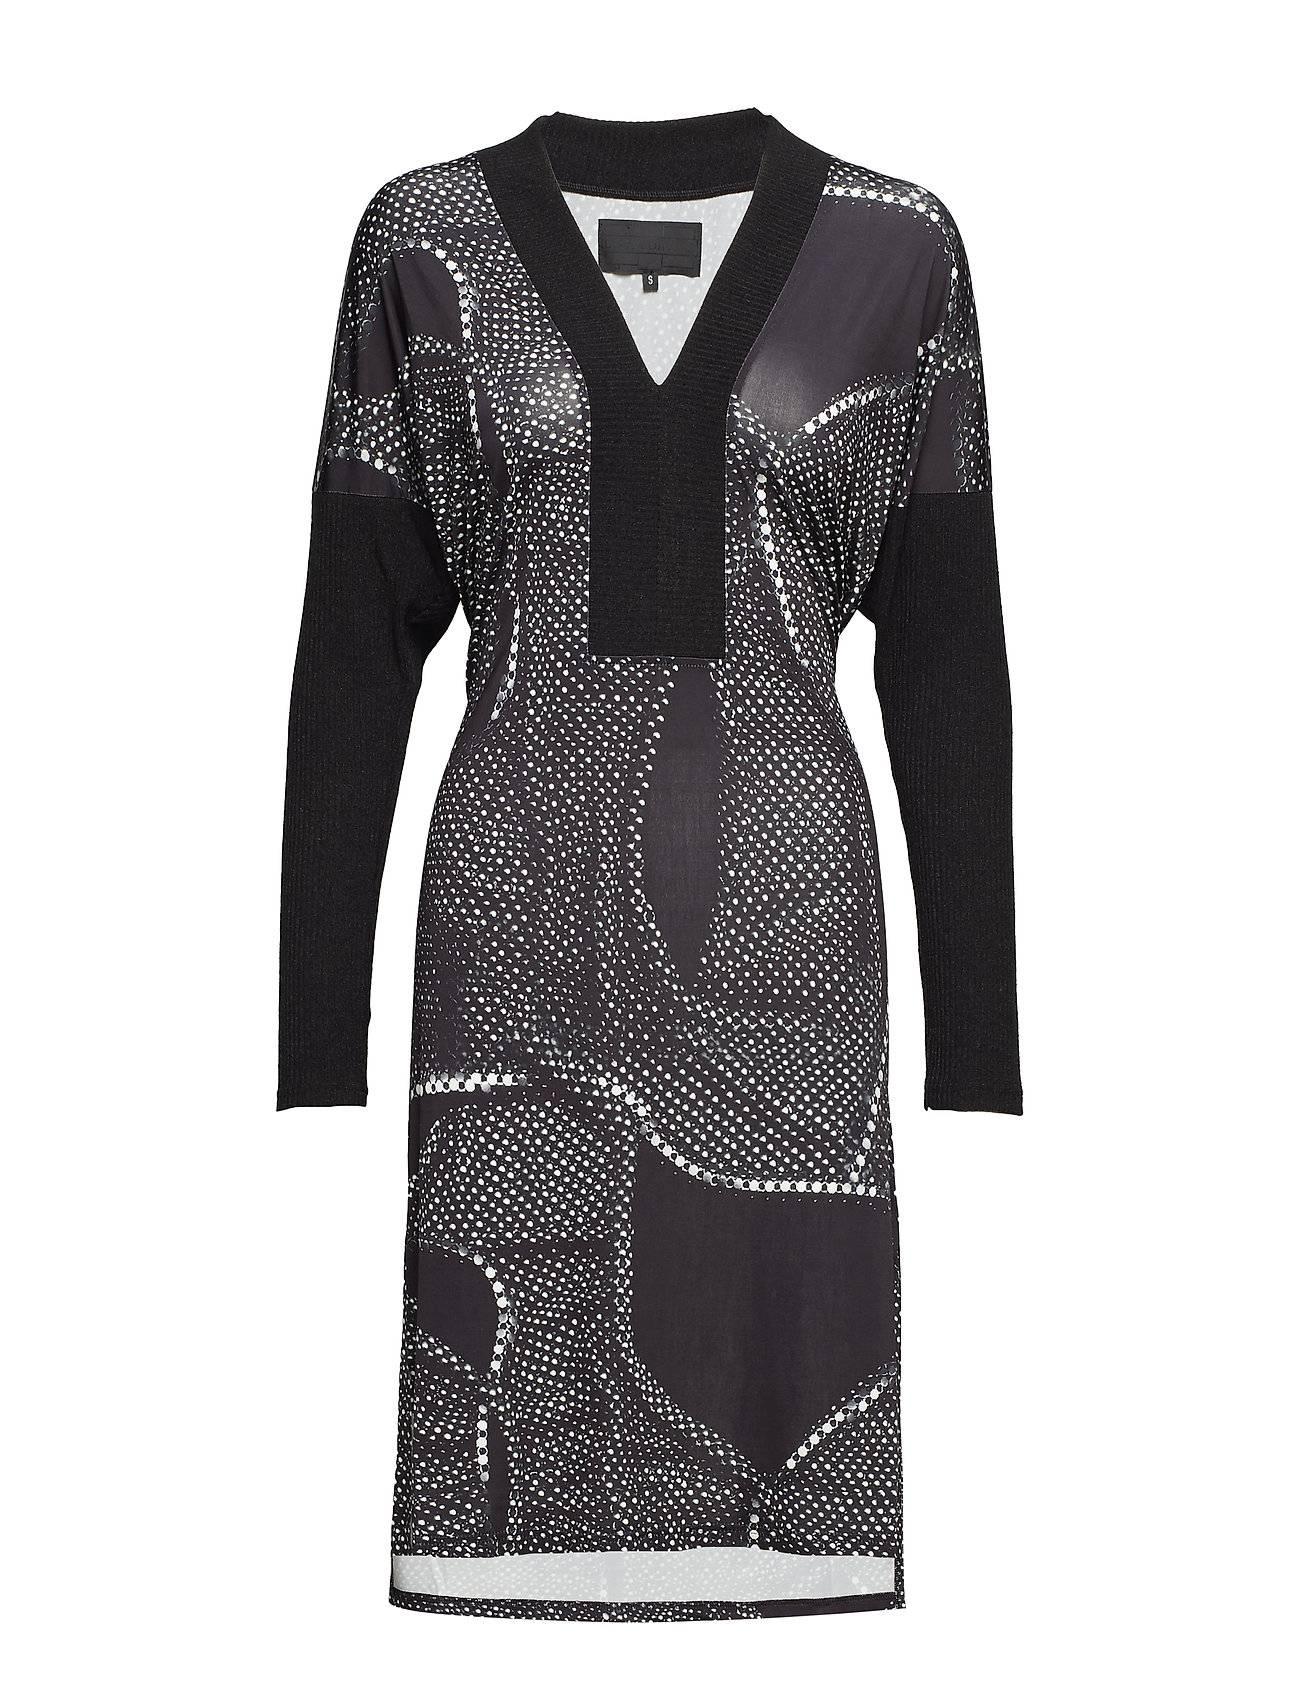 Diana Orving V-Neck Dress